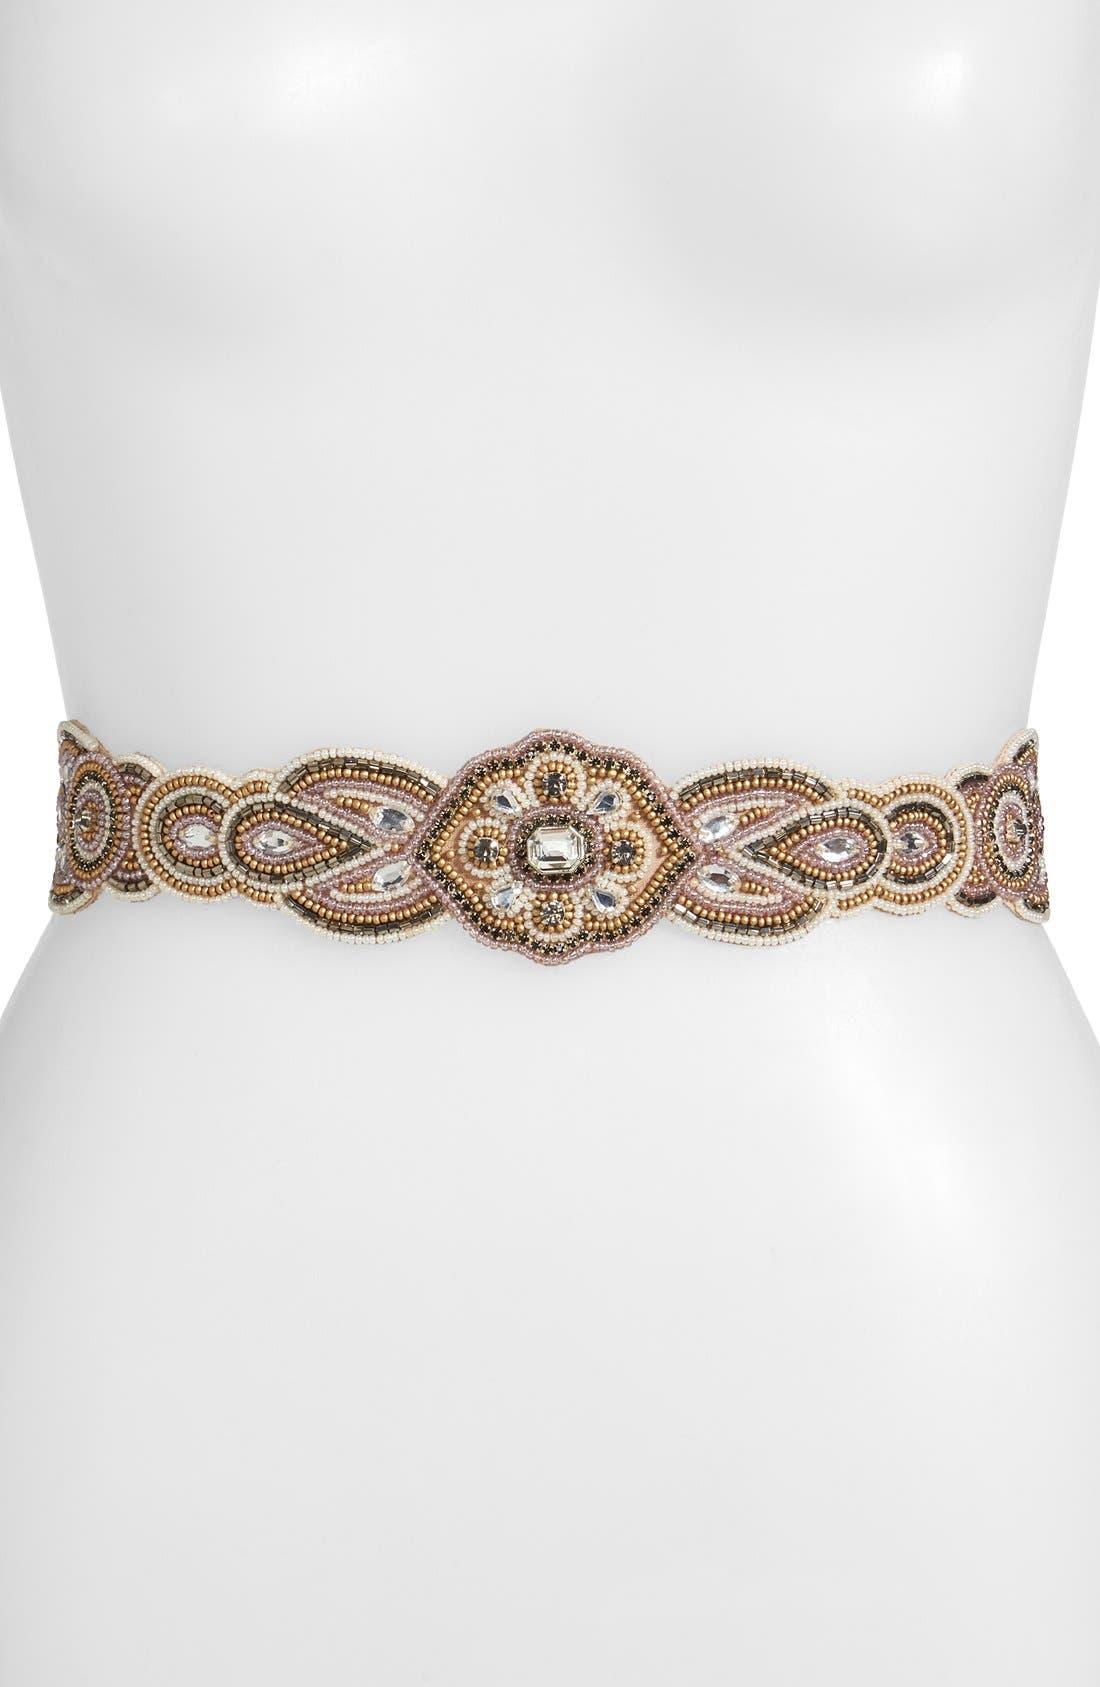 Main Image - Glint 'Aeolian' Beaded Stretch Belt